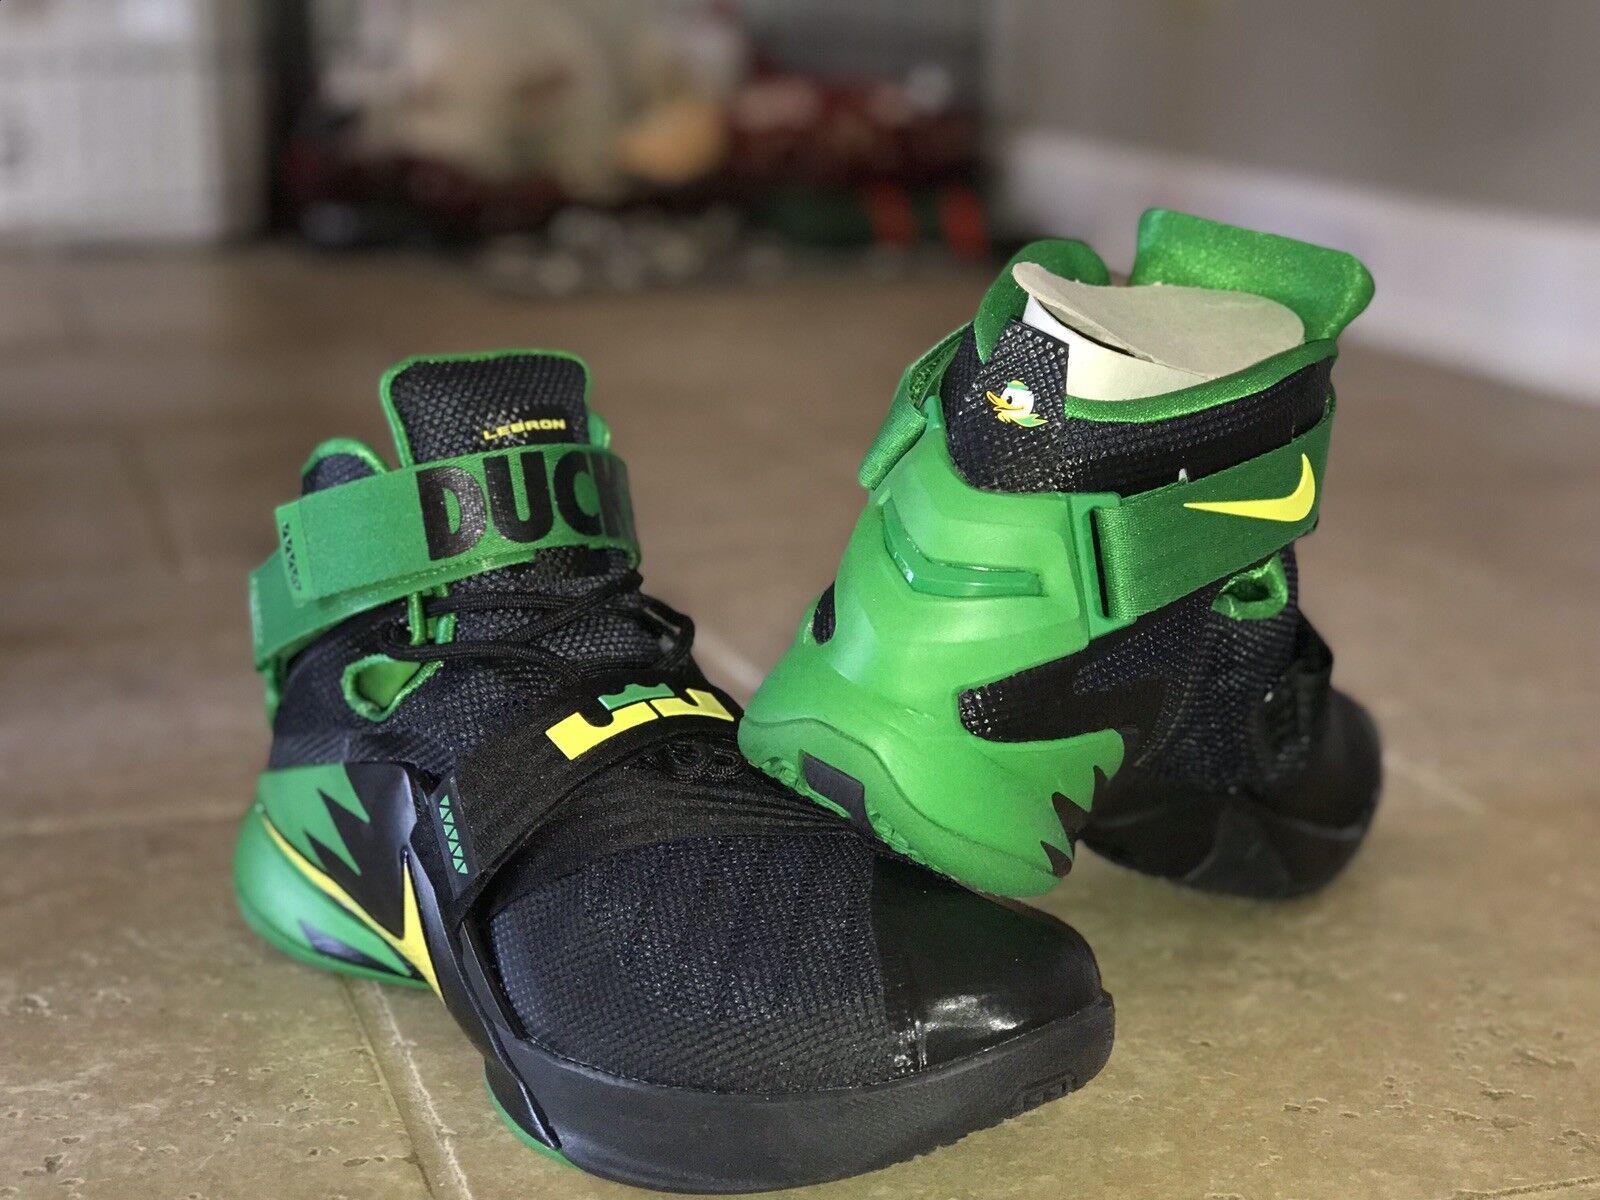 Nike Lebron Soldier IX PRM 749490-073 TEAM ISSUED PE Oregon Ducks DS SIZE 10.5